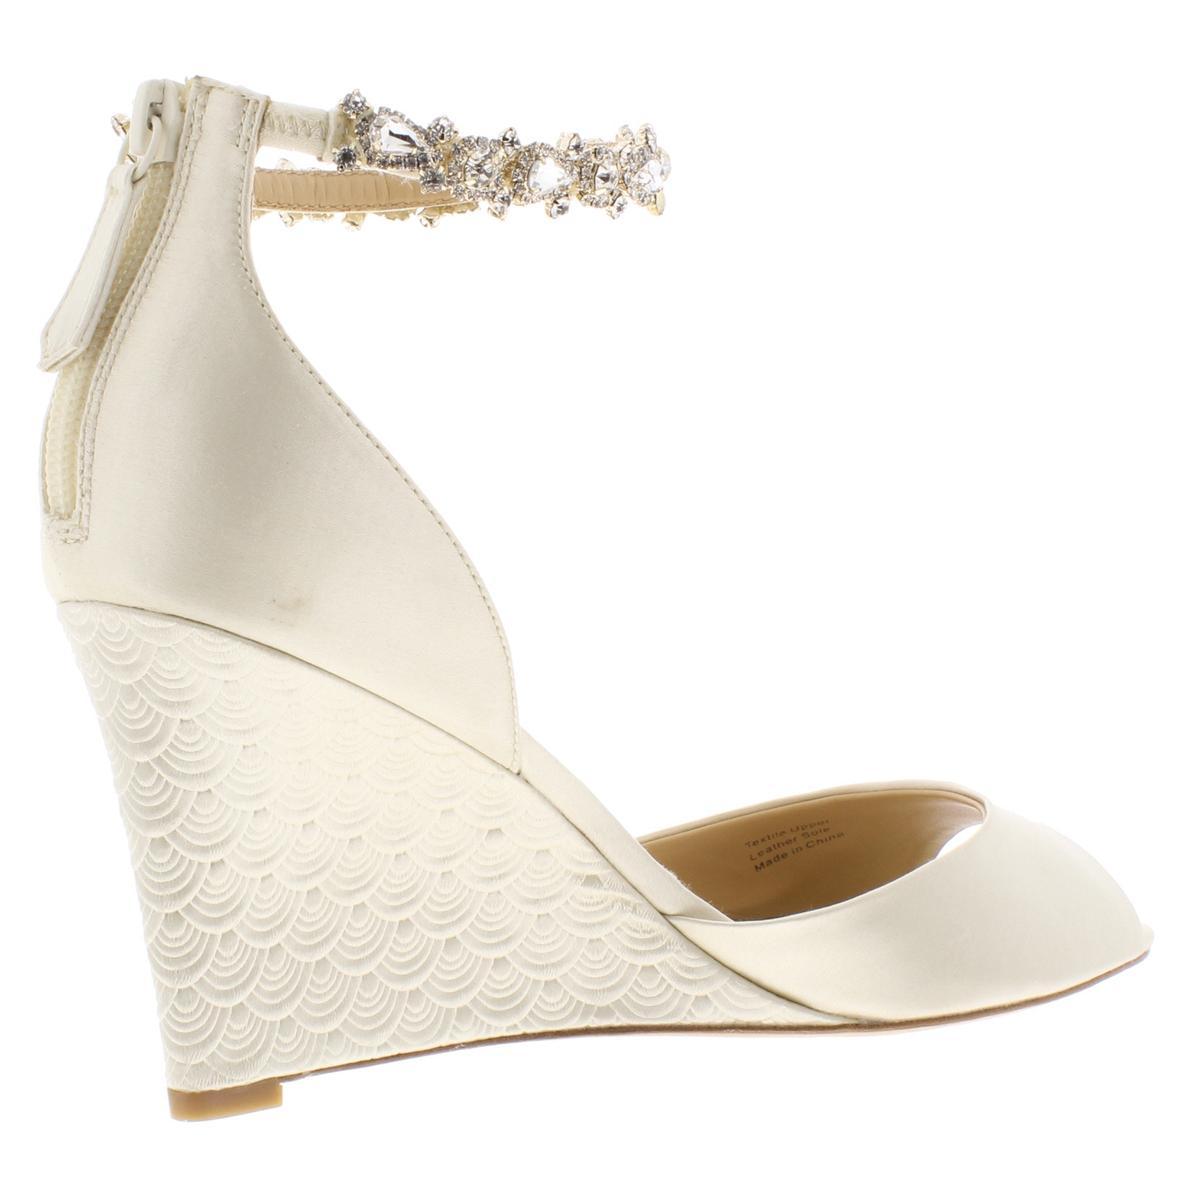 Badgley Mischka Womens Embellished Open Toe Dressy Wedge Heels Shoes Bhfo 9039